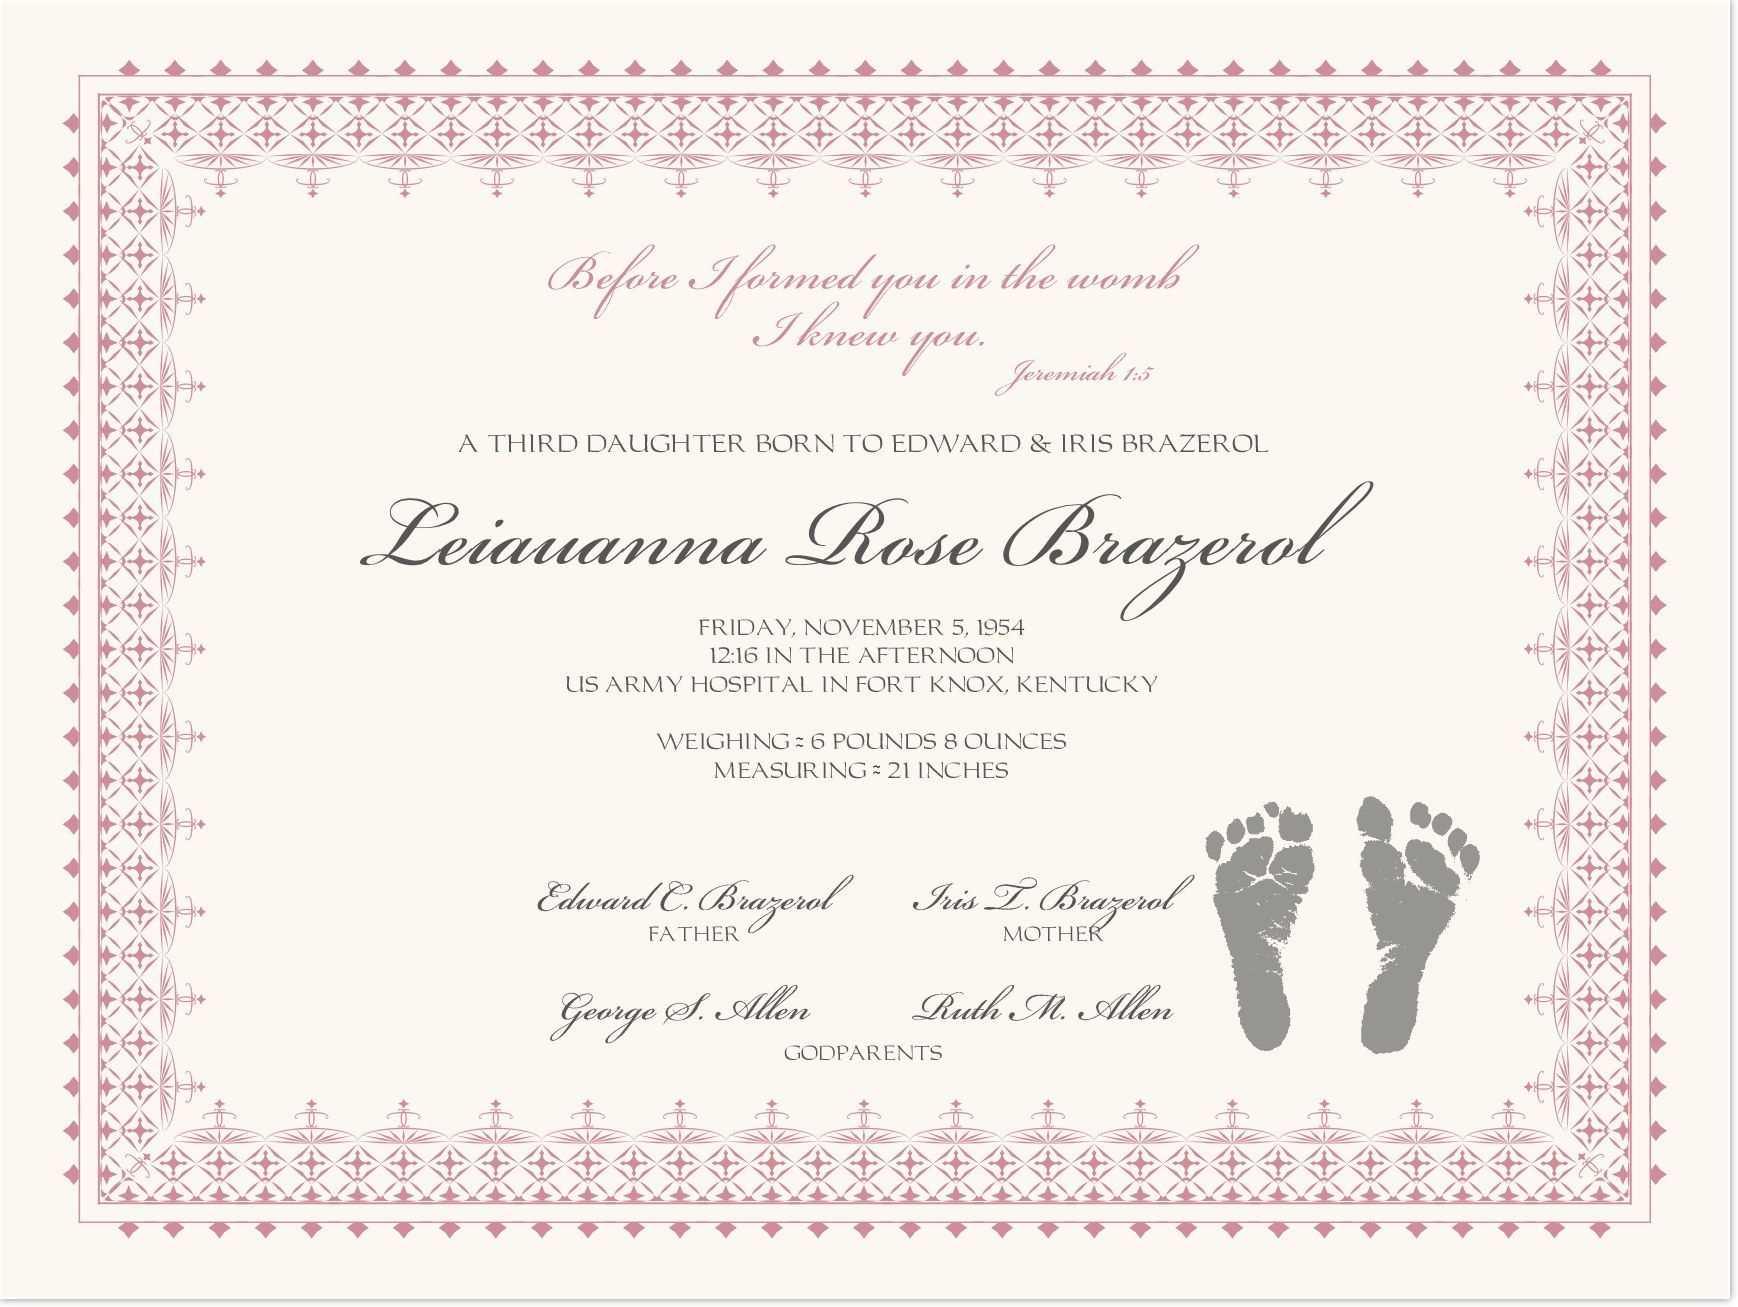 002 Baby Dedication Certificate Template Ideas Wonderful For Baby Christening Certificate Template